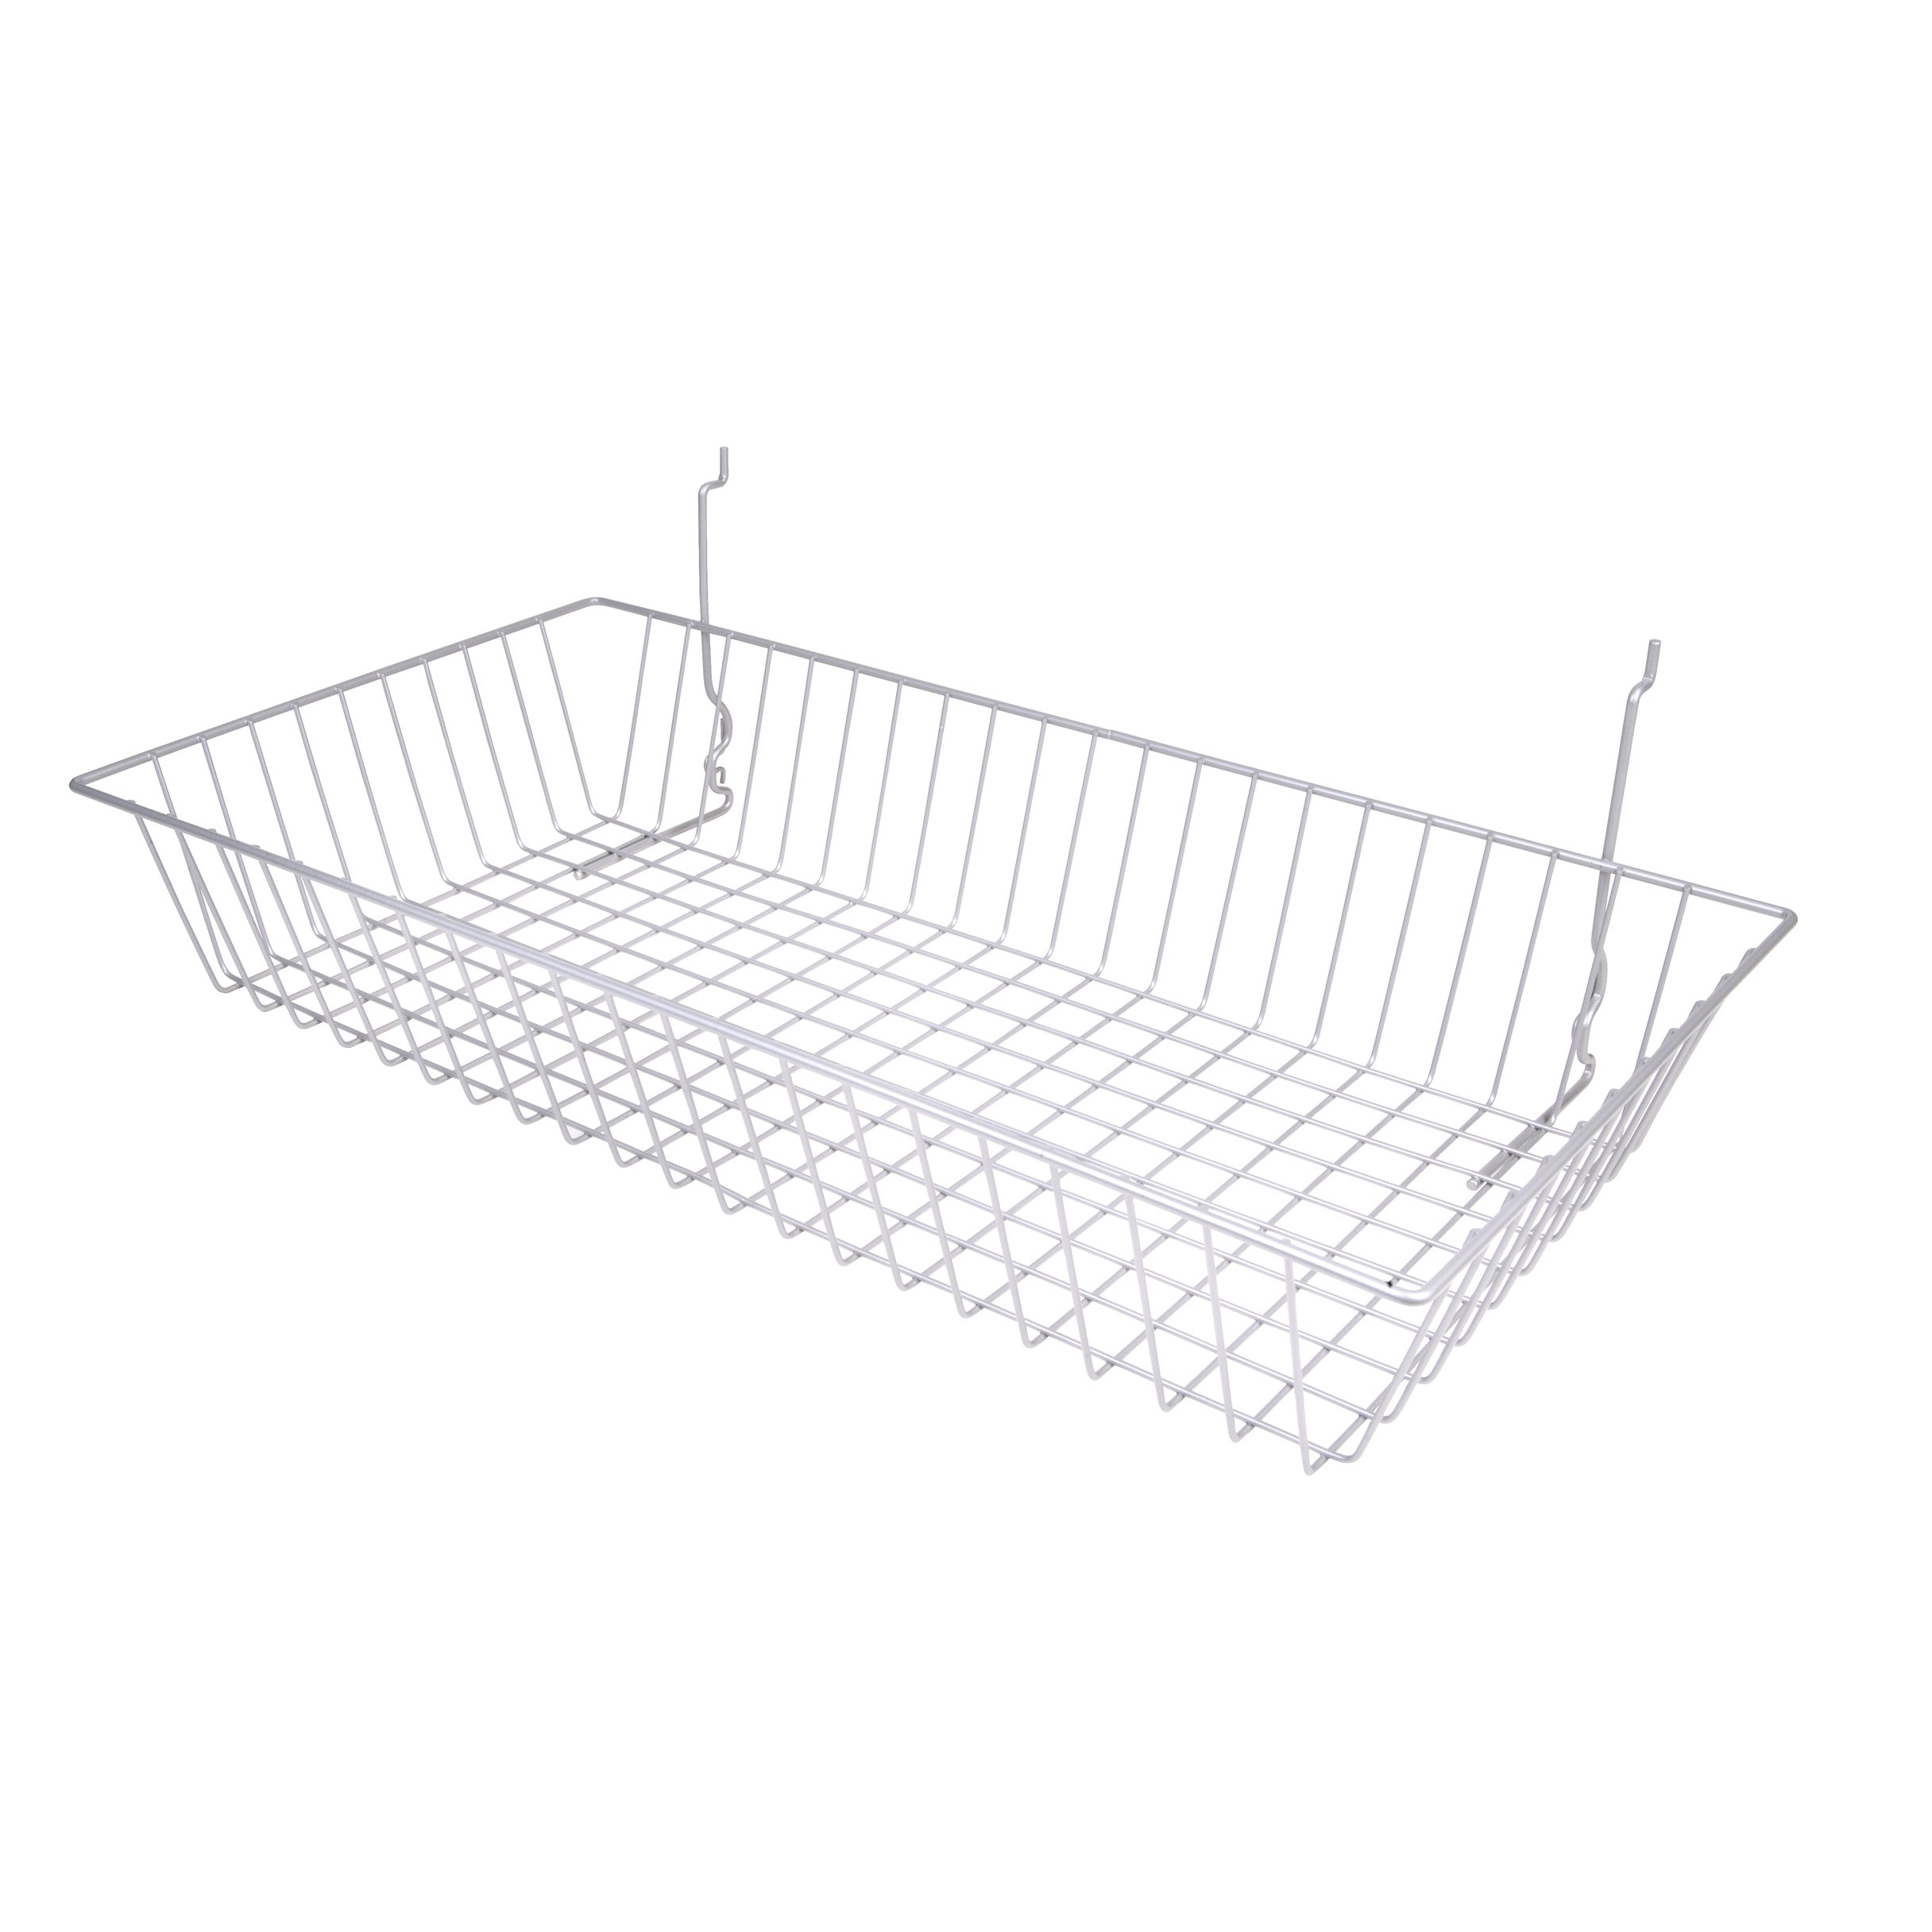 Chrome Multi Use Wire Basket Slatwall Gridwall Pegboard Slatgrid 24''W x 12''D x 4''H Lot of 6 - New